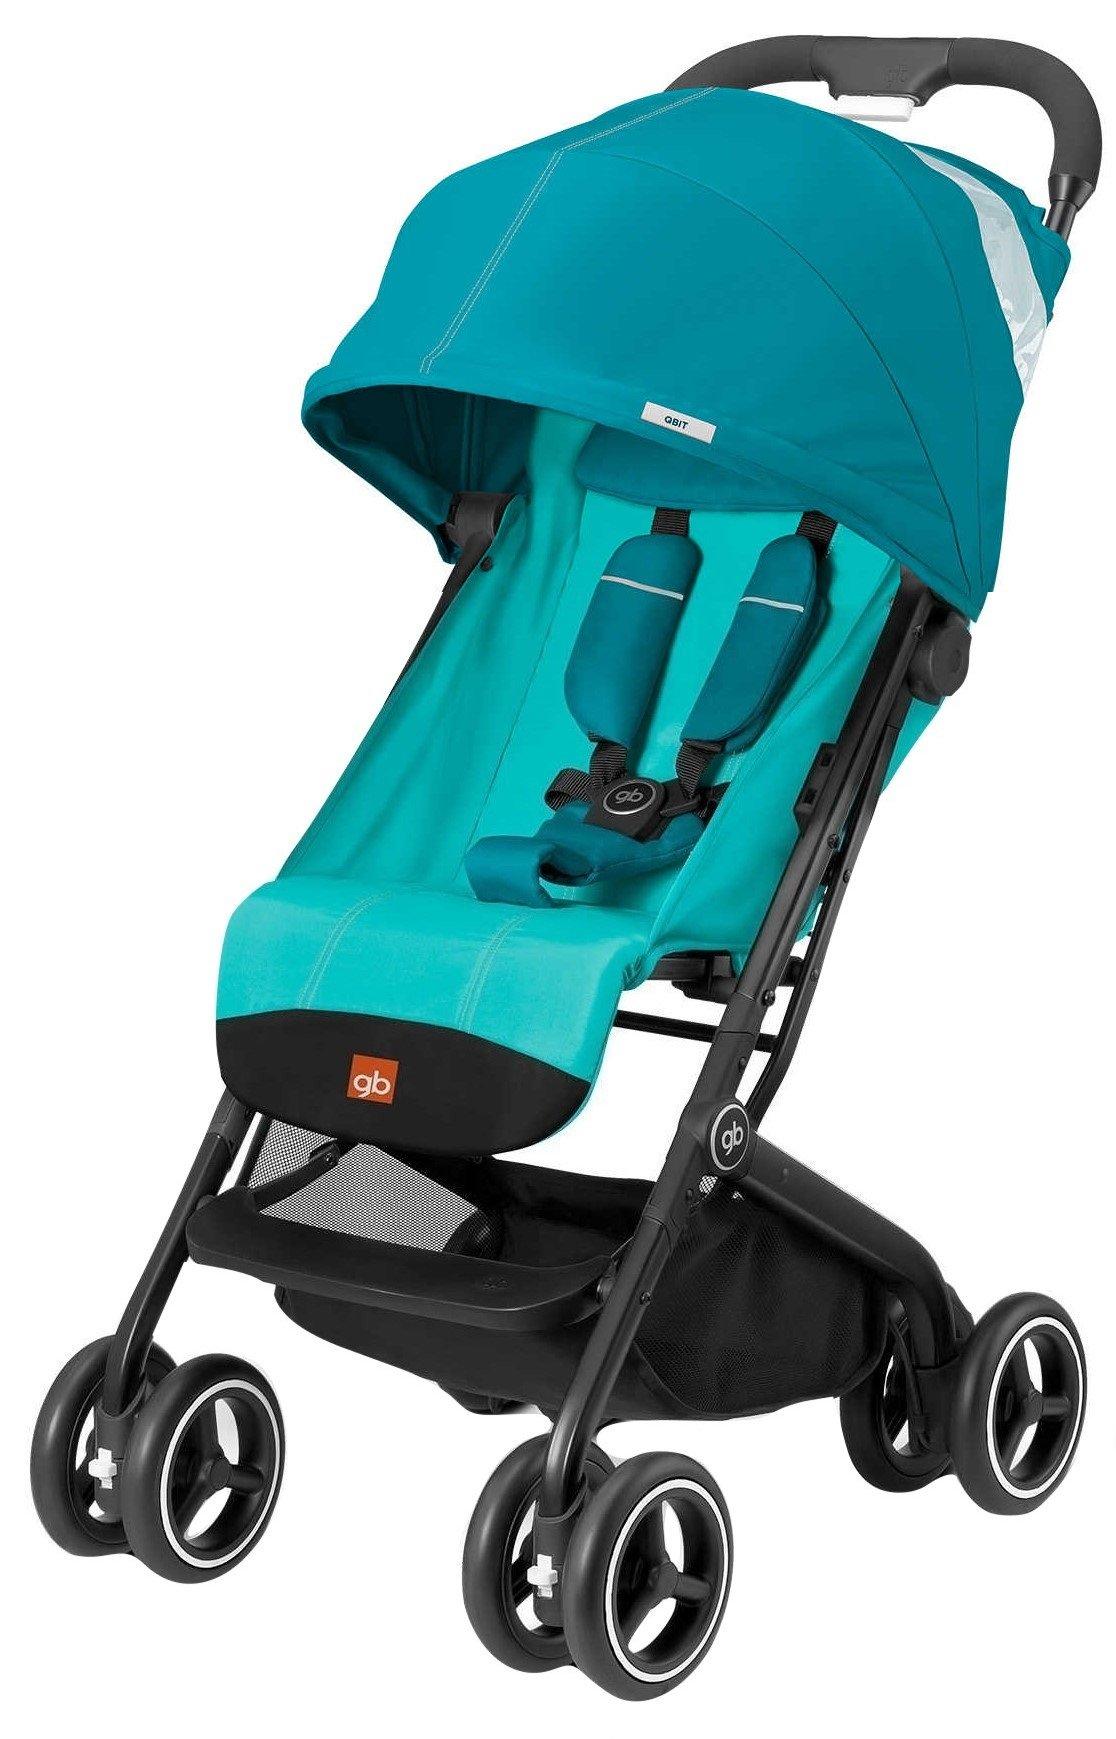 GB QBit Plus (Capri Blue) Baby strollers, Travel